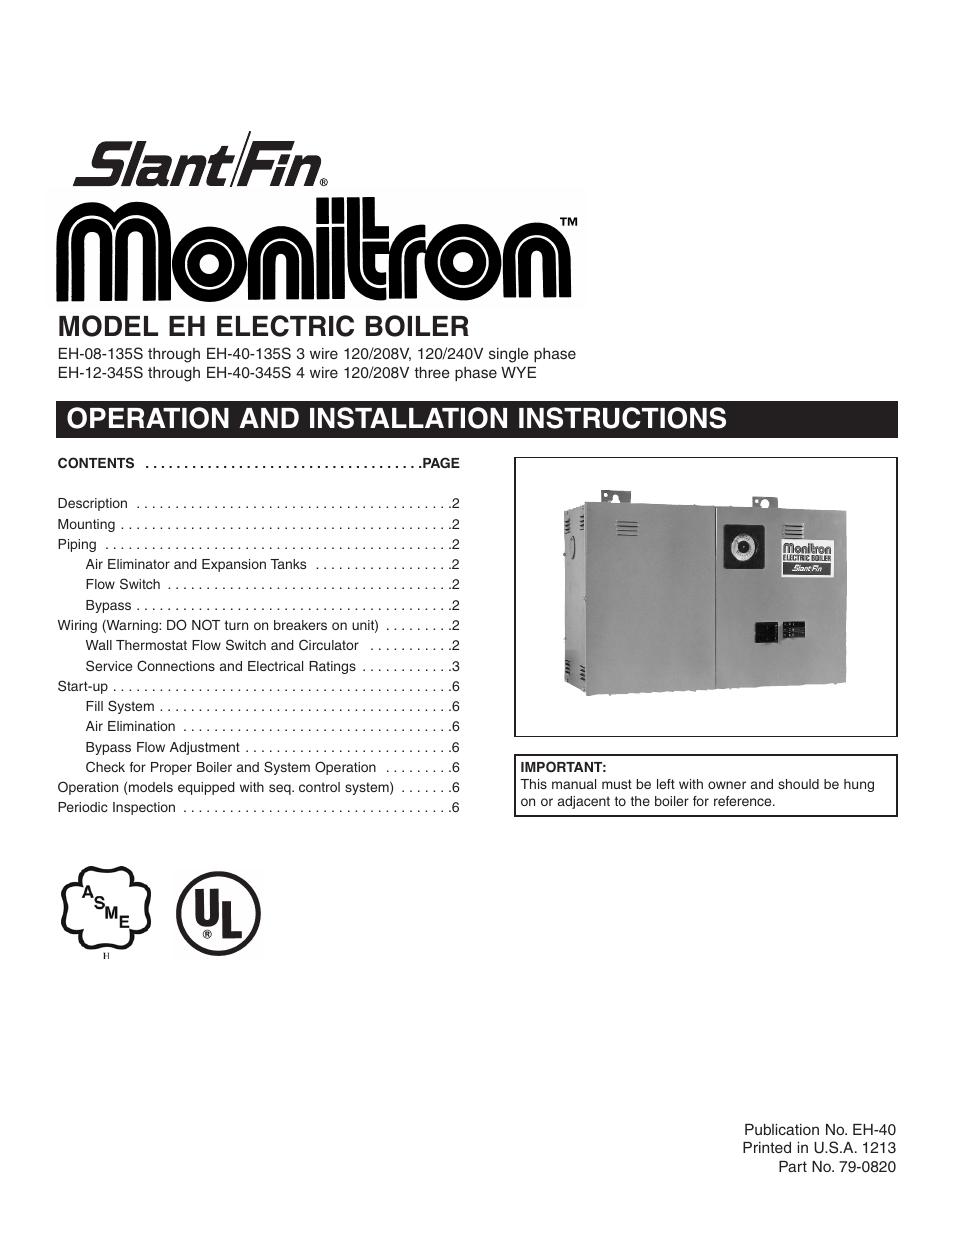 slant fin wiring wiring diagram slant fin boiler problems slant fin eh user manual 6 pages